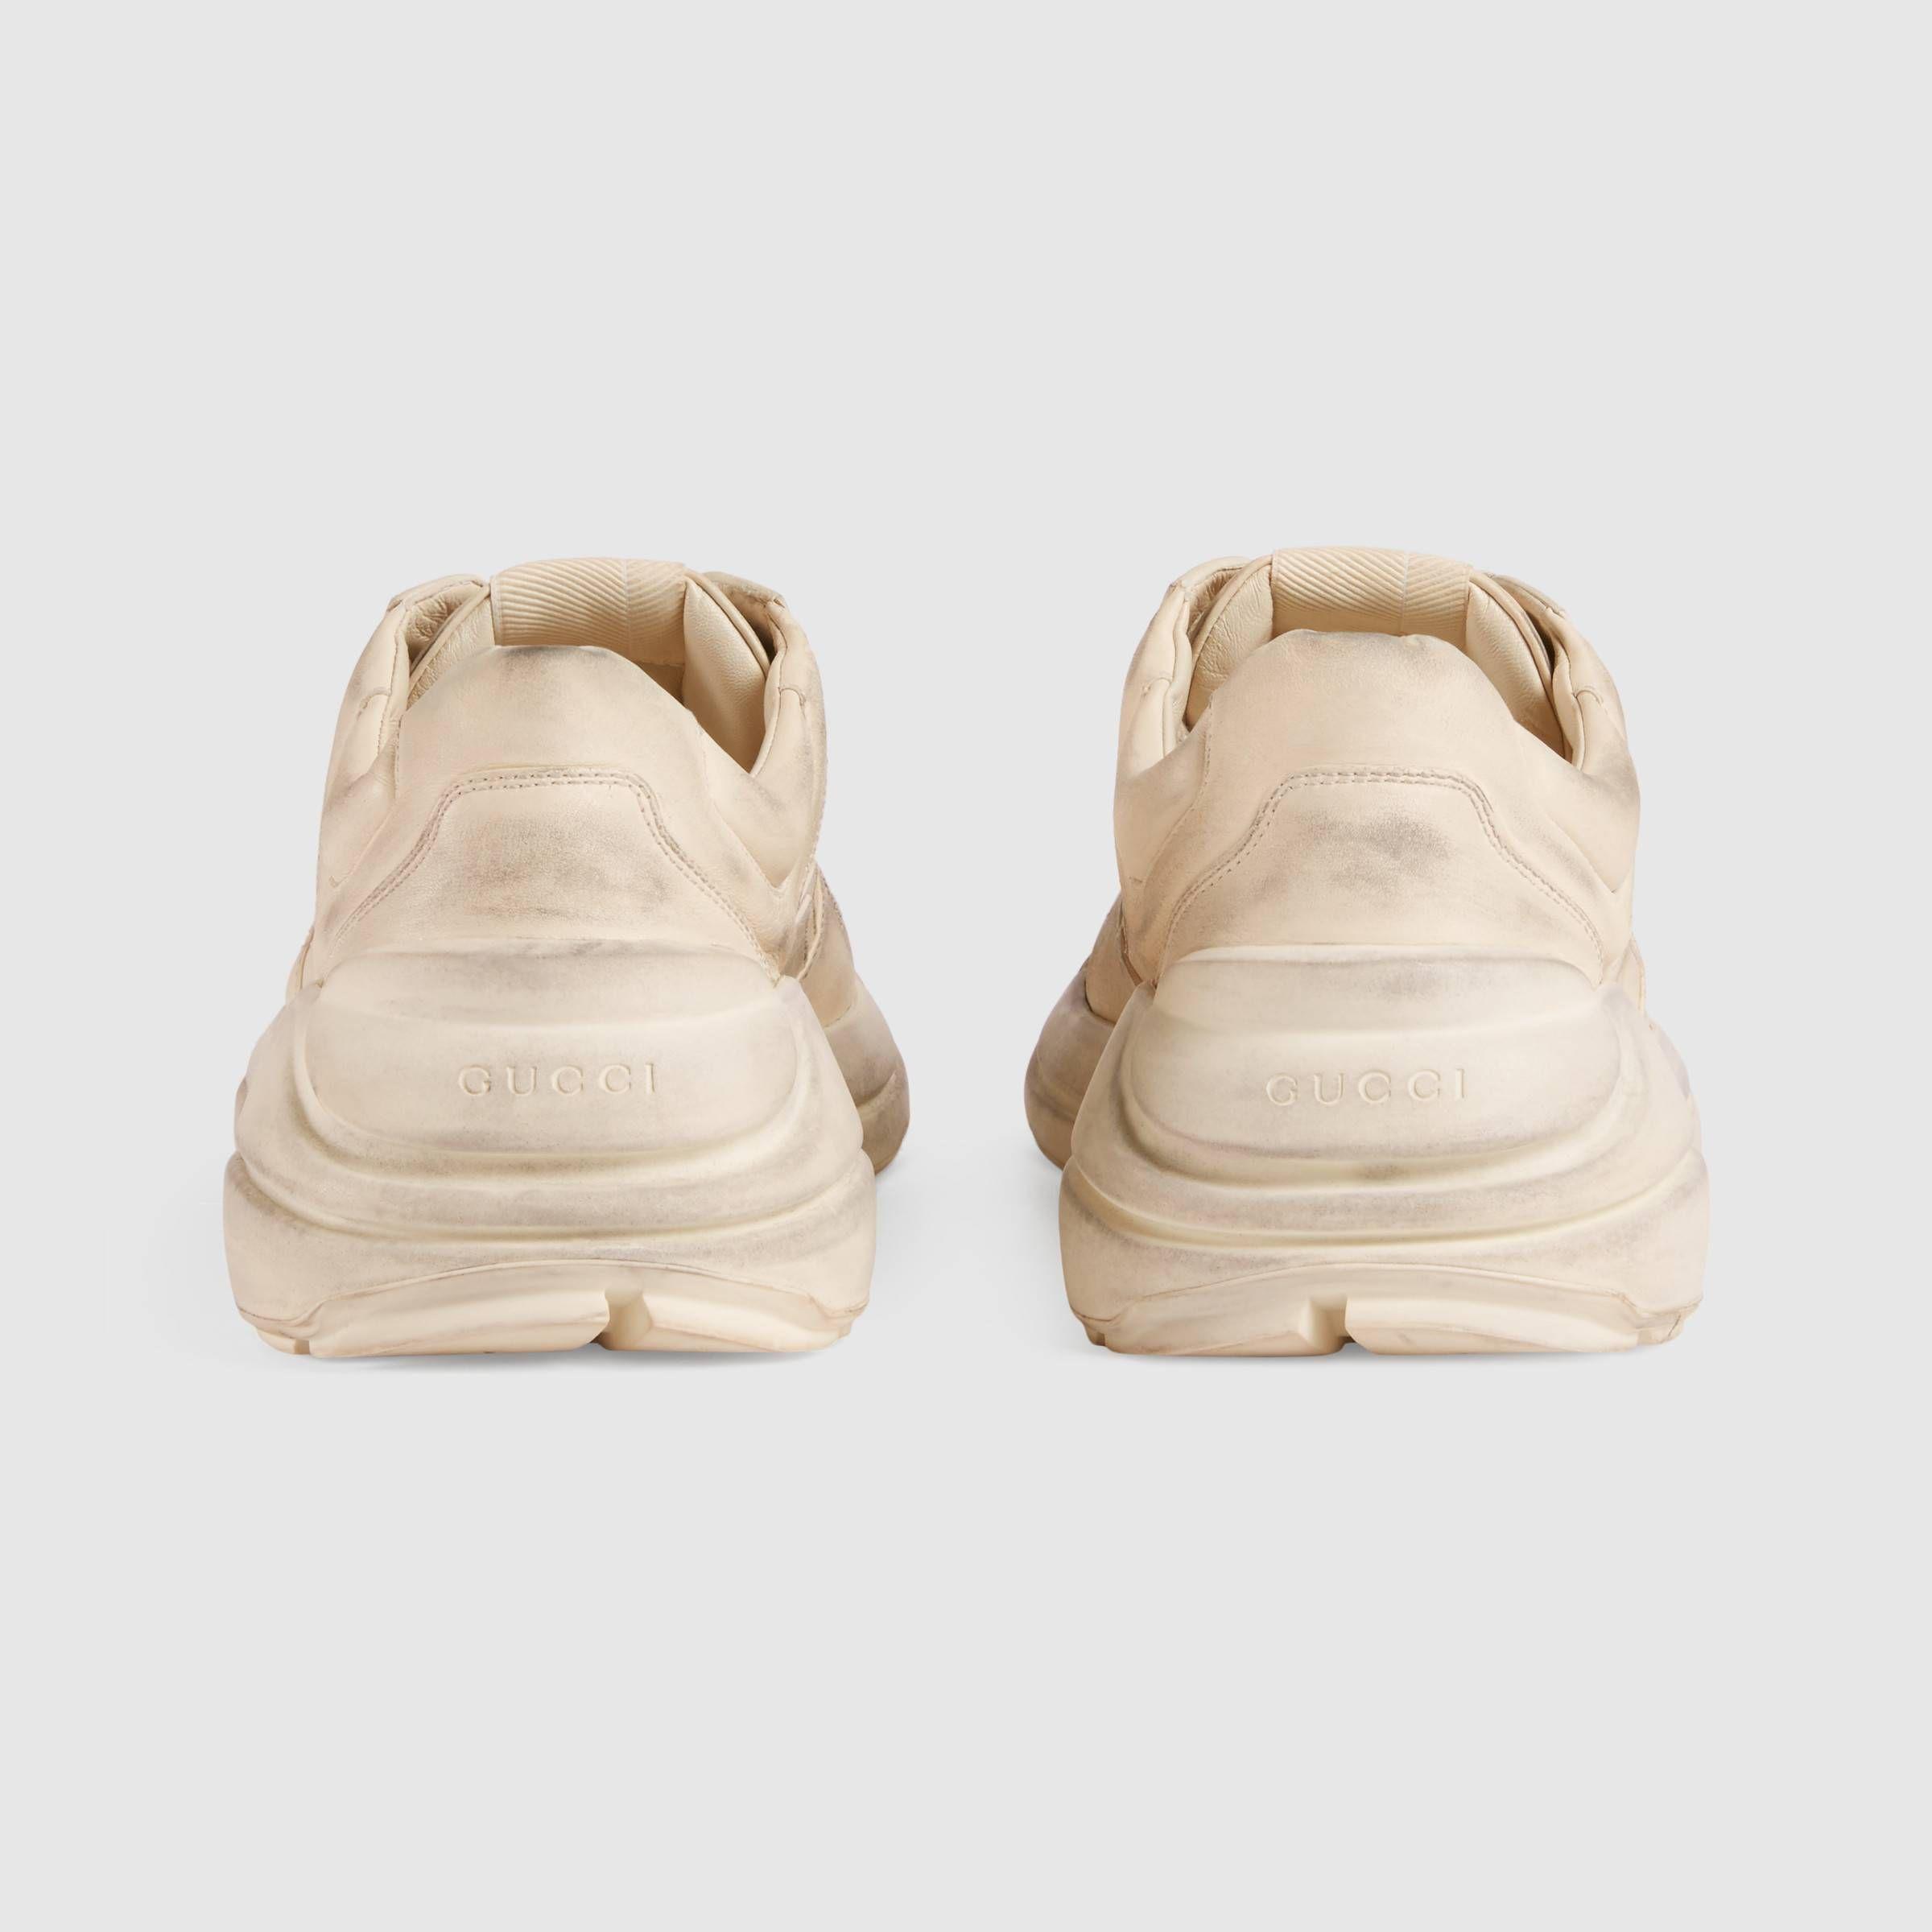 d0d61bb593d Gucci Rhyton leather sneaker Detail 4